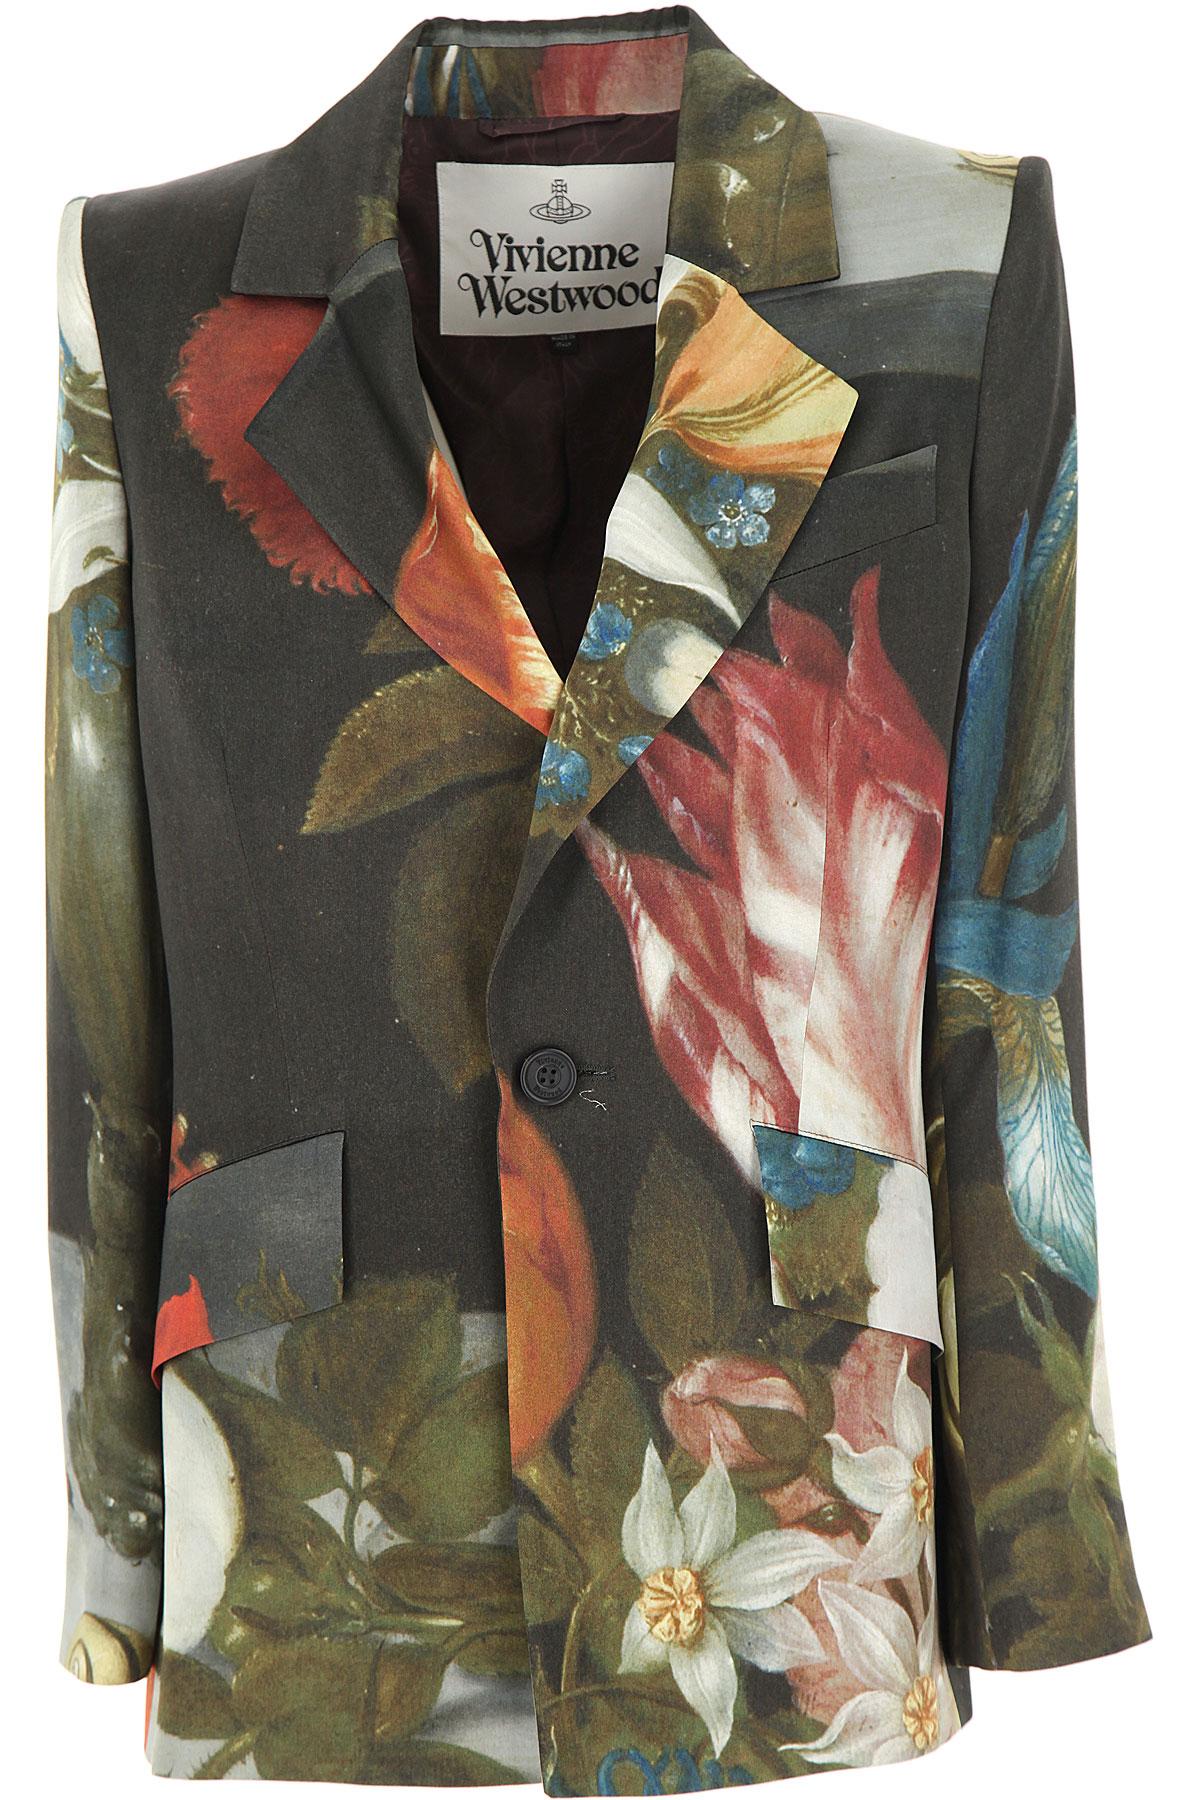 Vivienne Westwood Blazer for Women On Sale, Multicolor, Viscose, 2019, 4 6